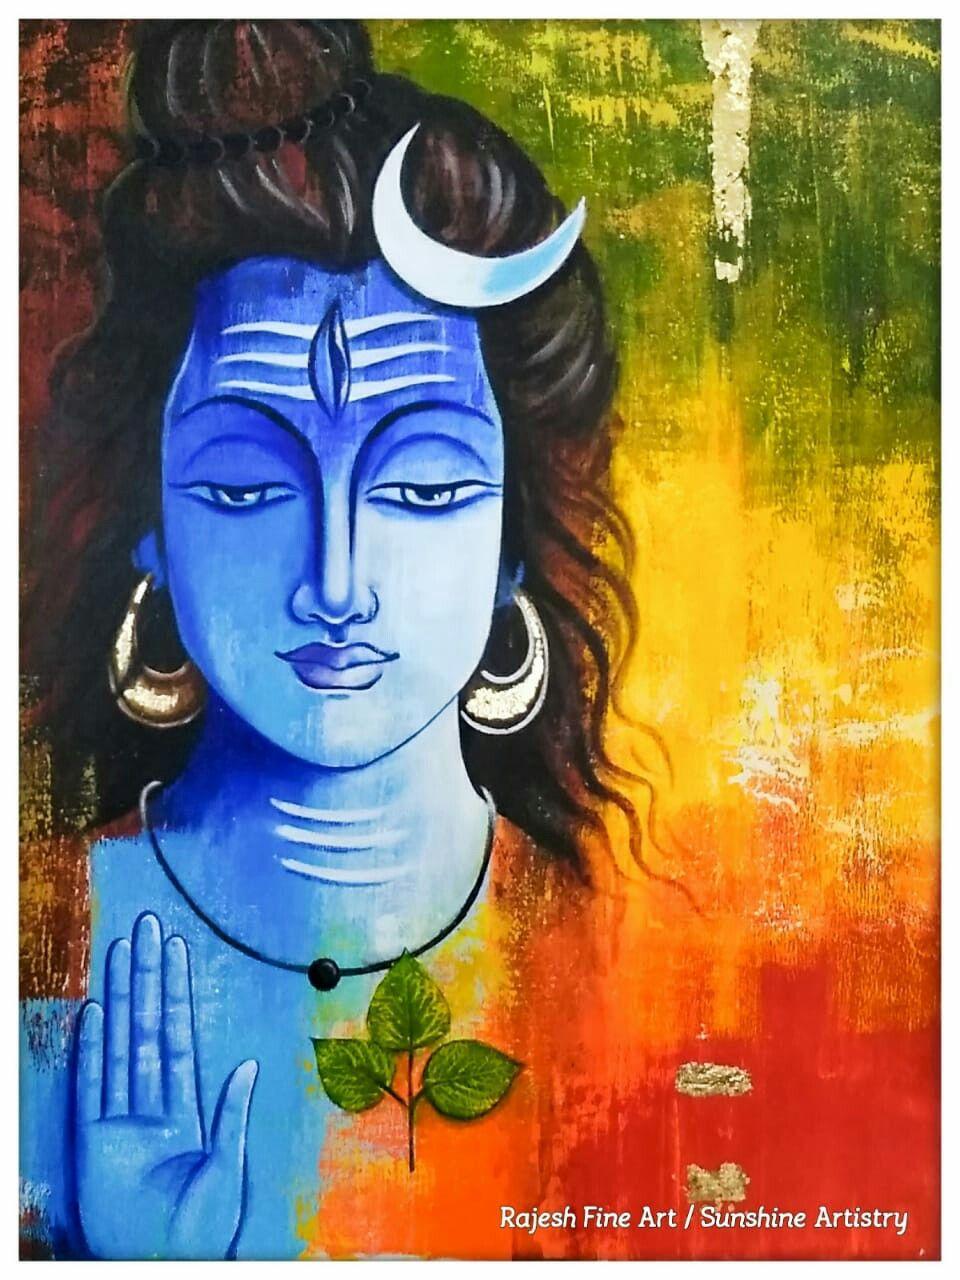 Pin By Ashok Yadav On Rajesh Fine Art Lord Ganesha Paintings